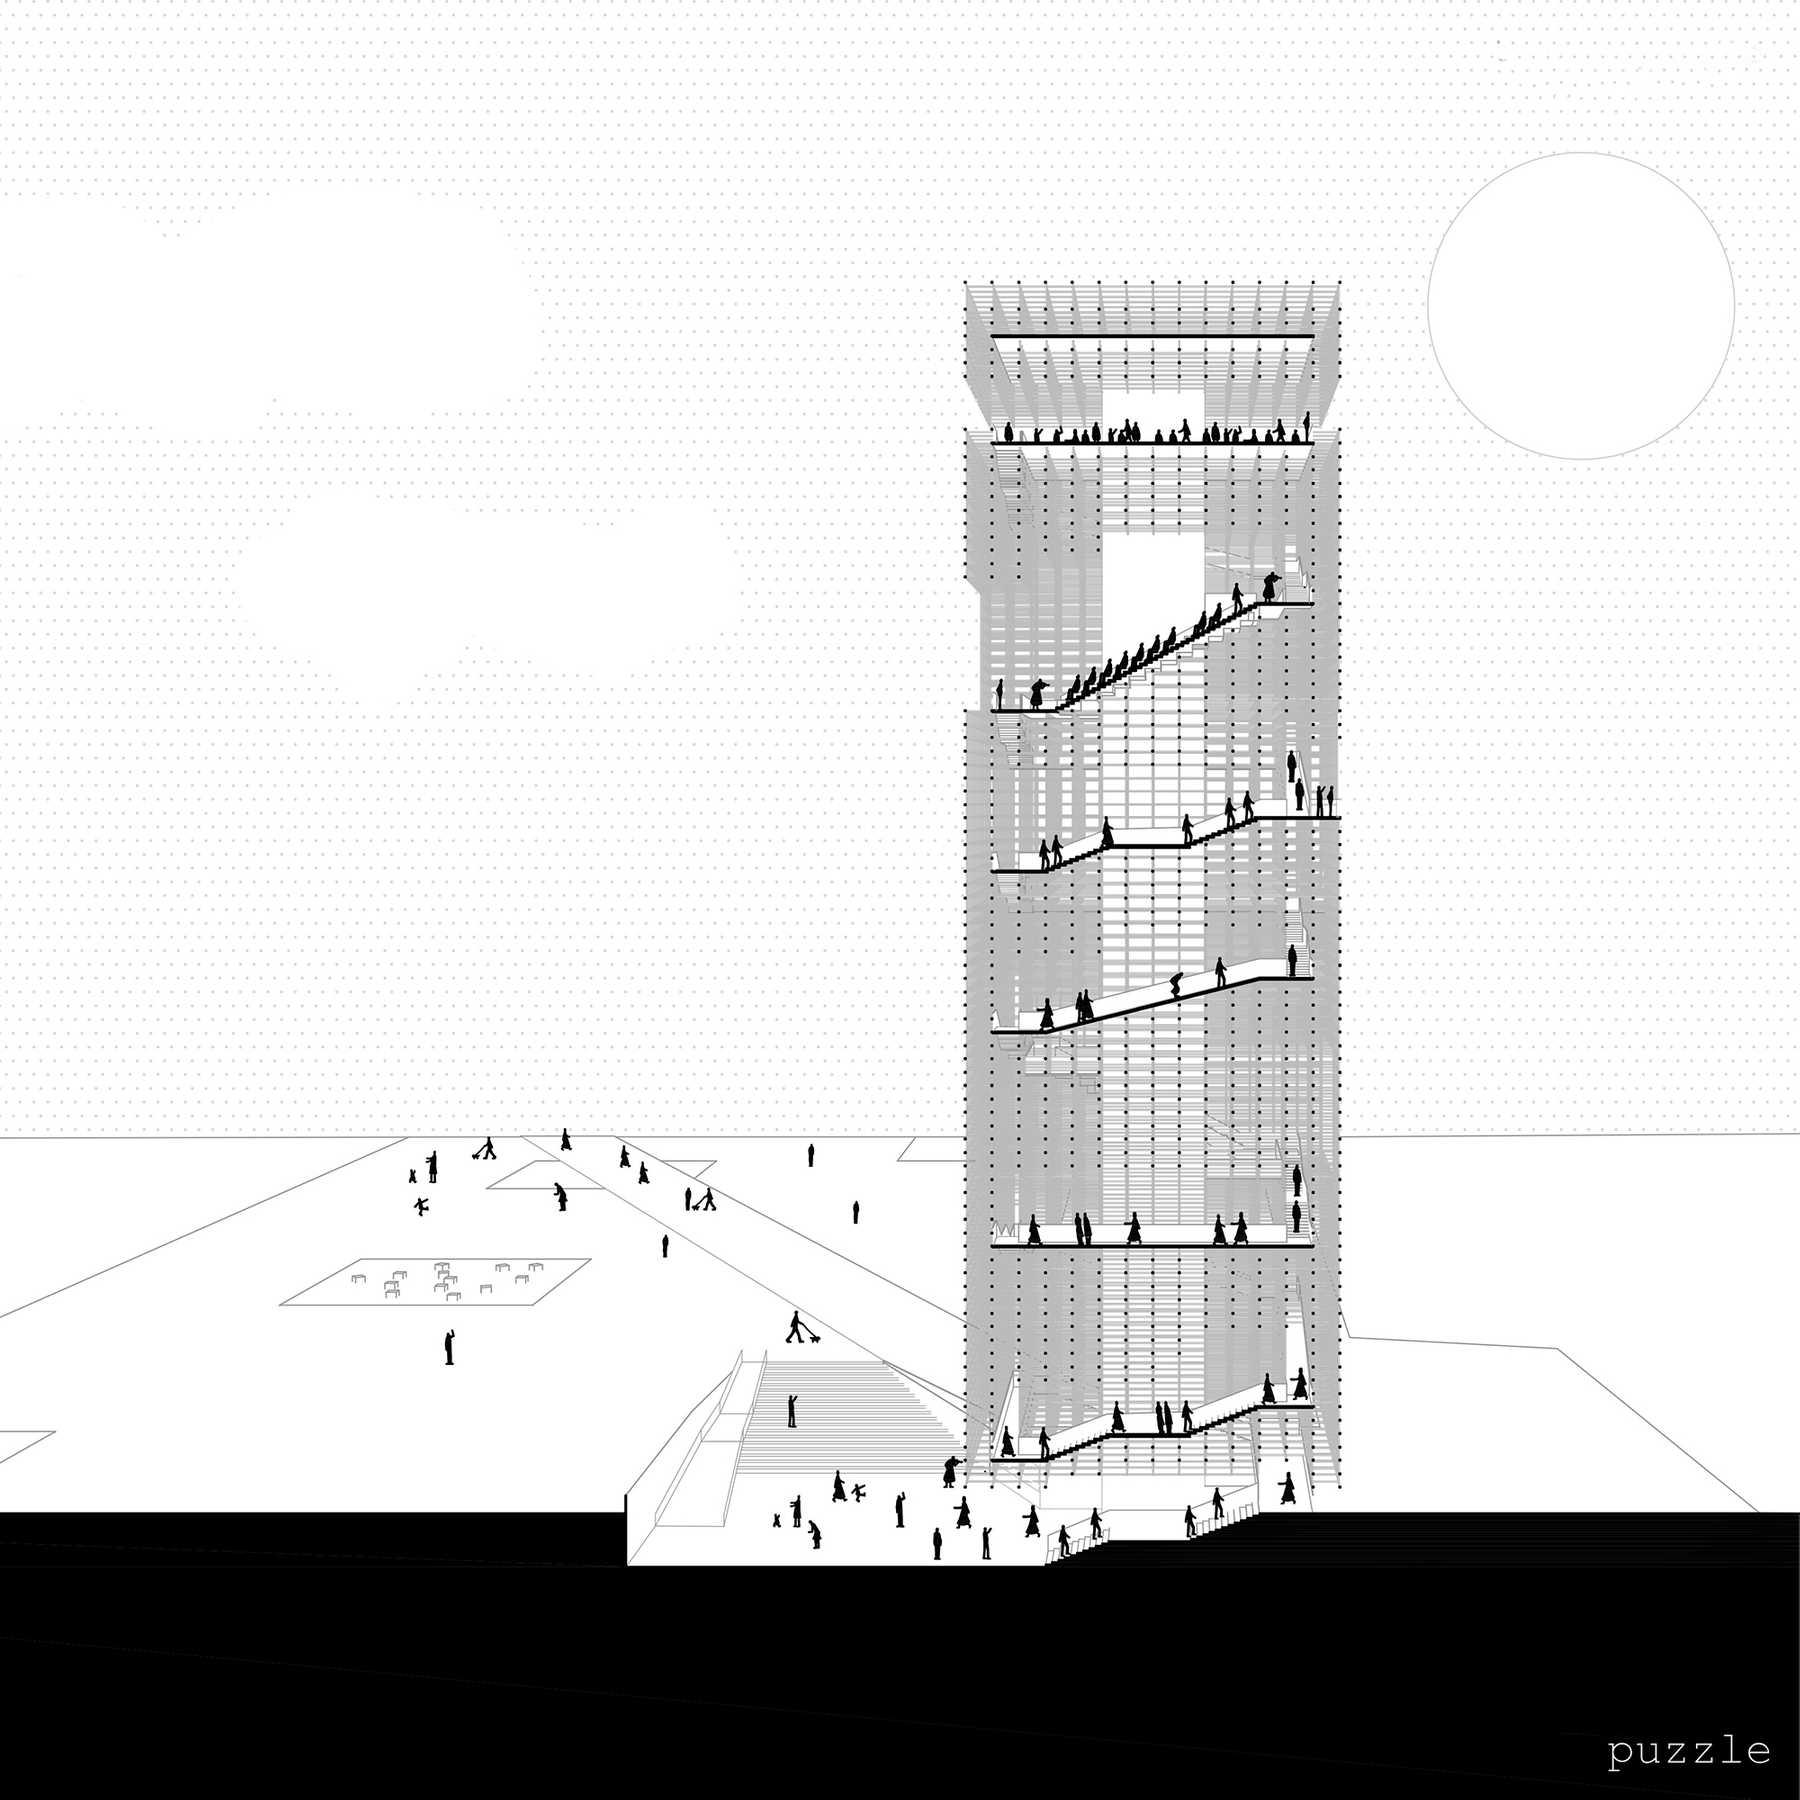 ascension-tower-6.jpg